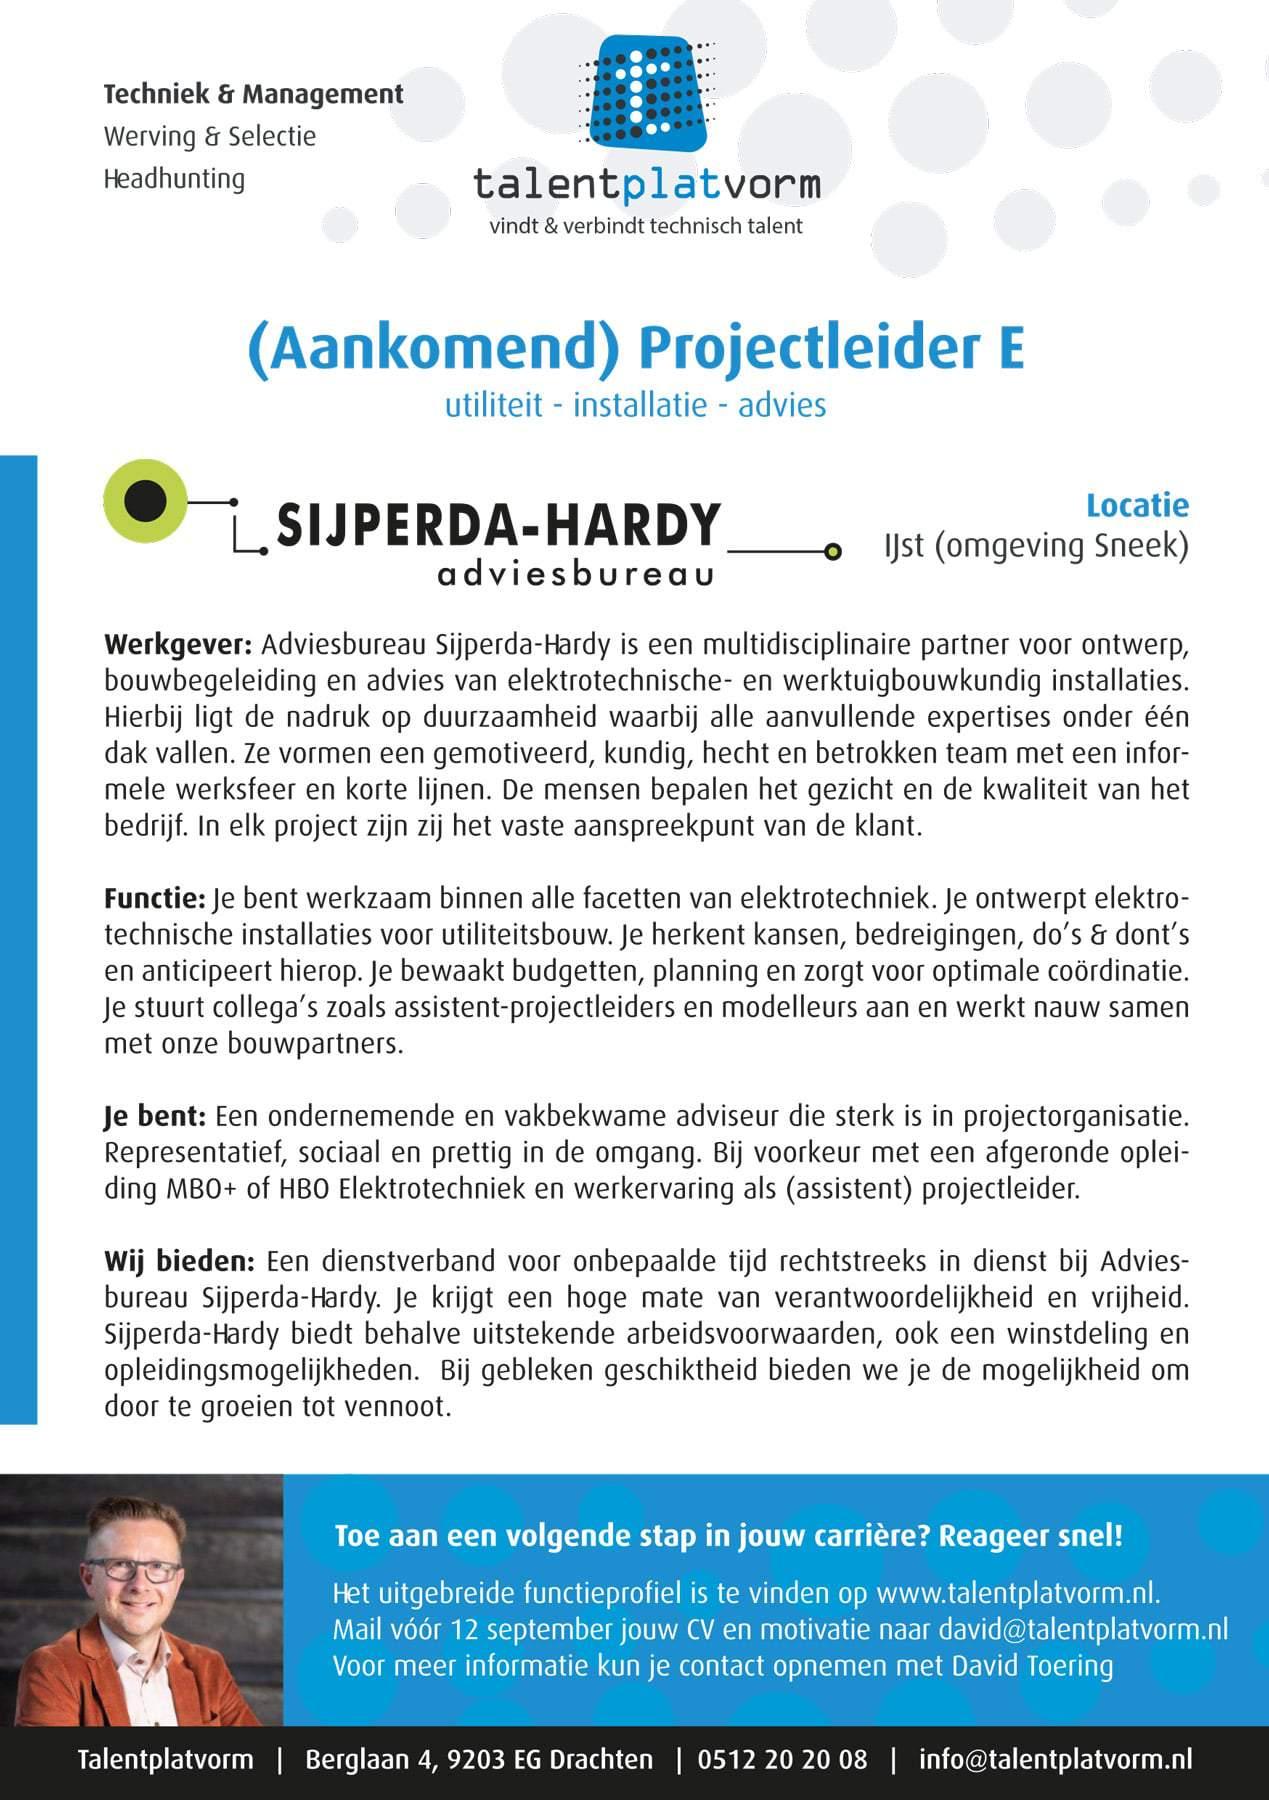 Projectleider Elektrotechniek Sijperda-Hardy